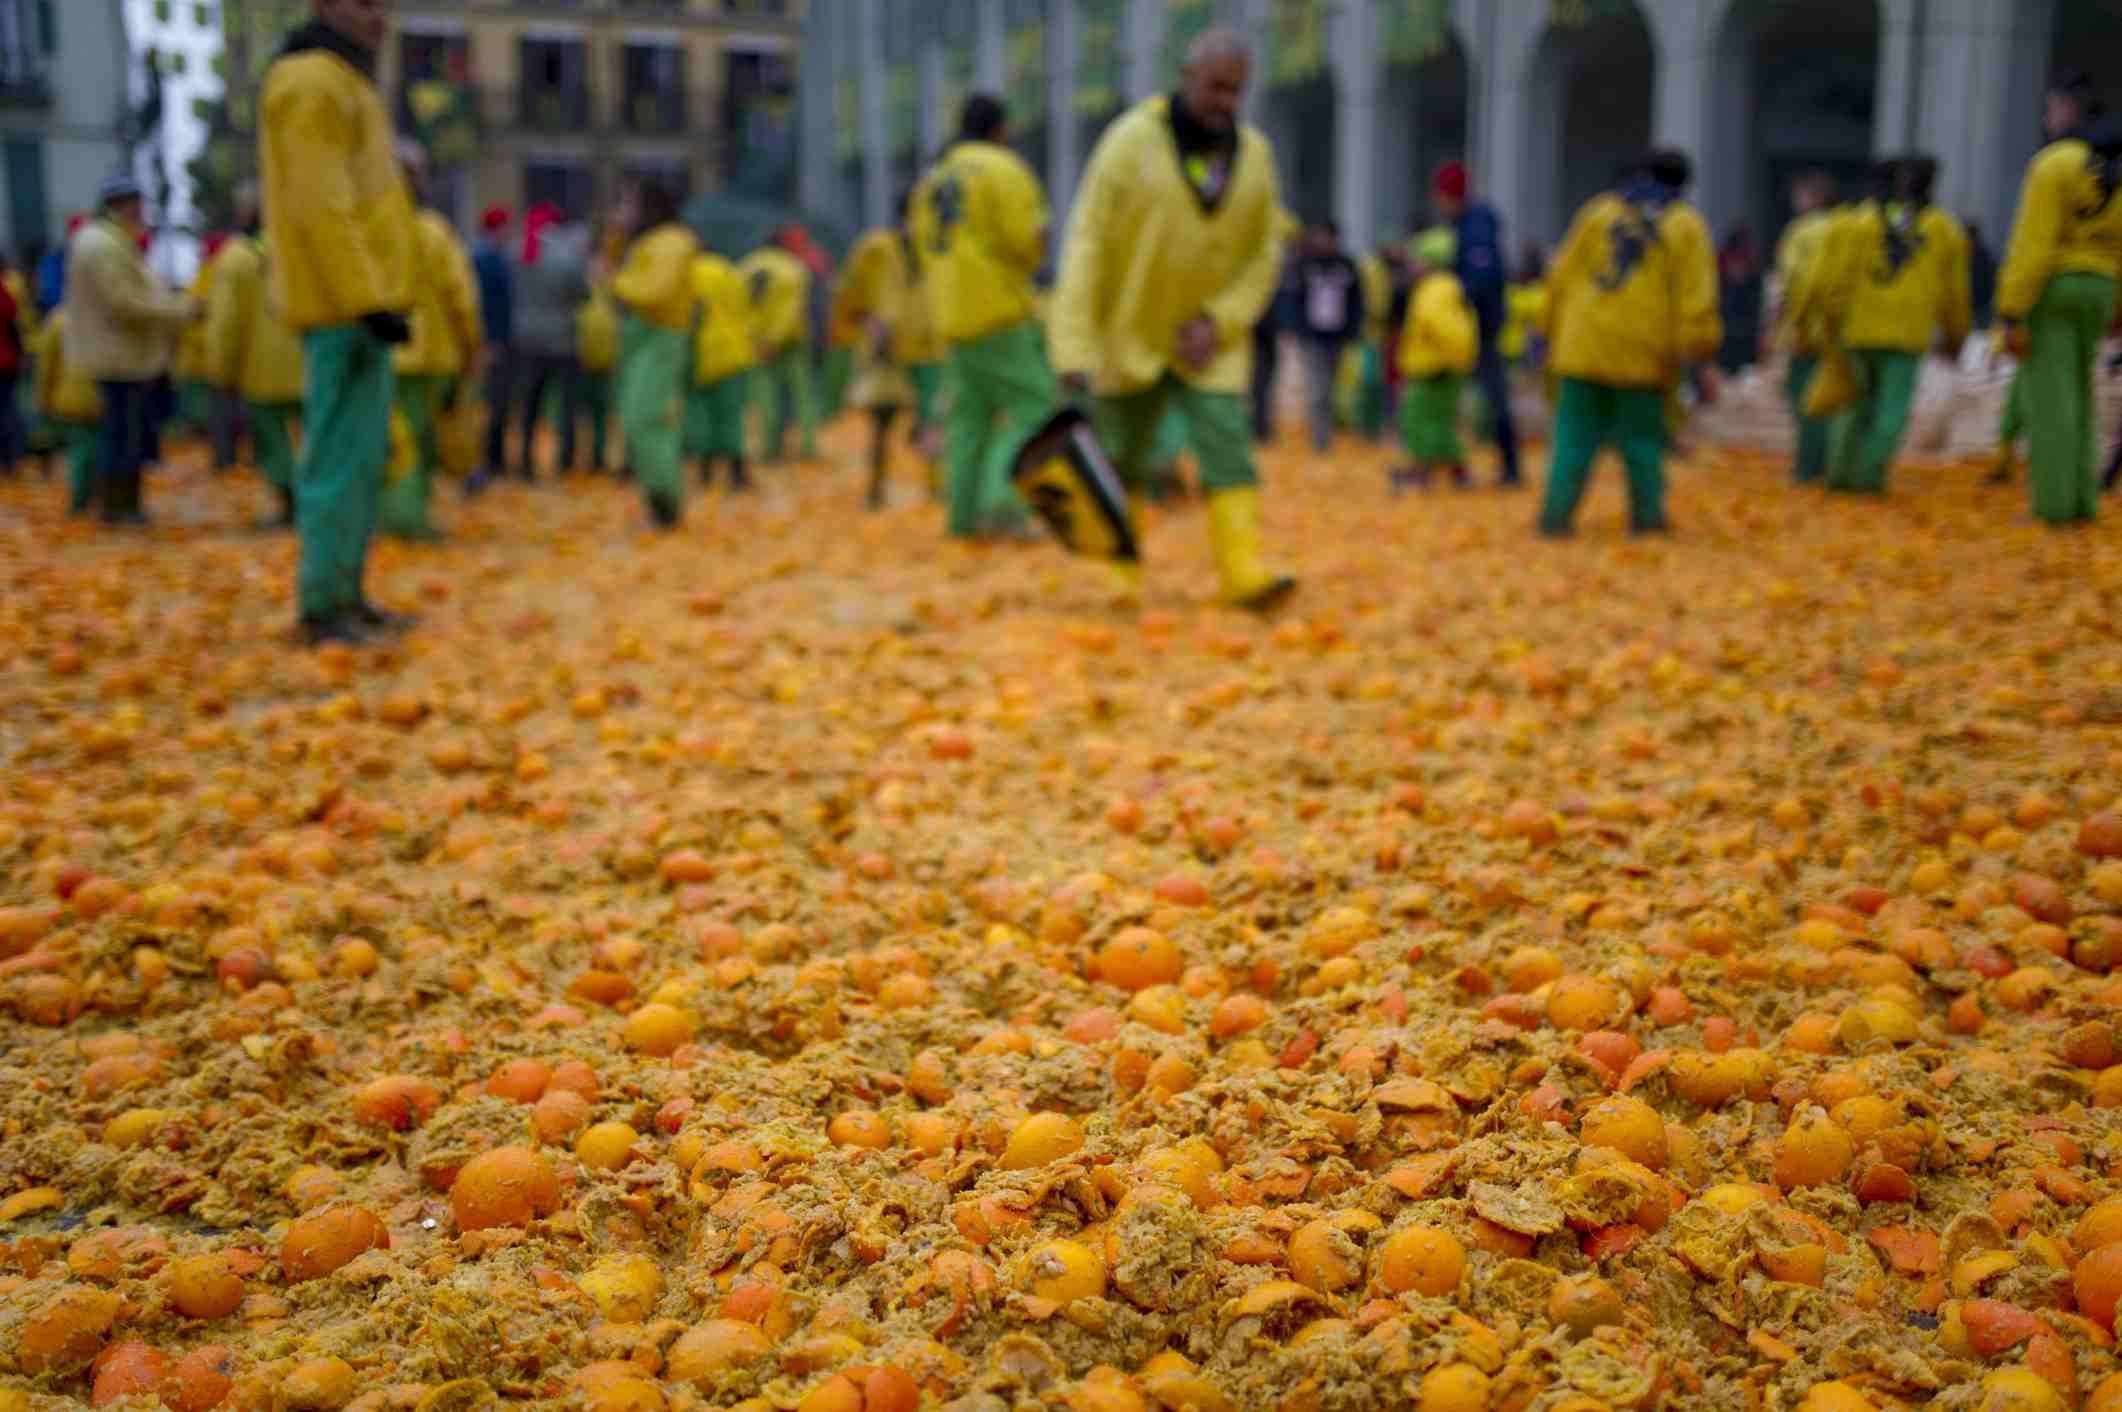 Aftermath of the Carnevale orange battle, Ivrea, Torino province, Piedmont, Italy